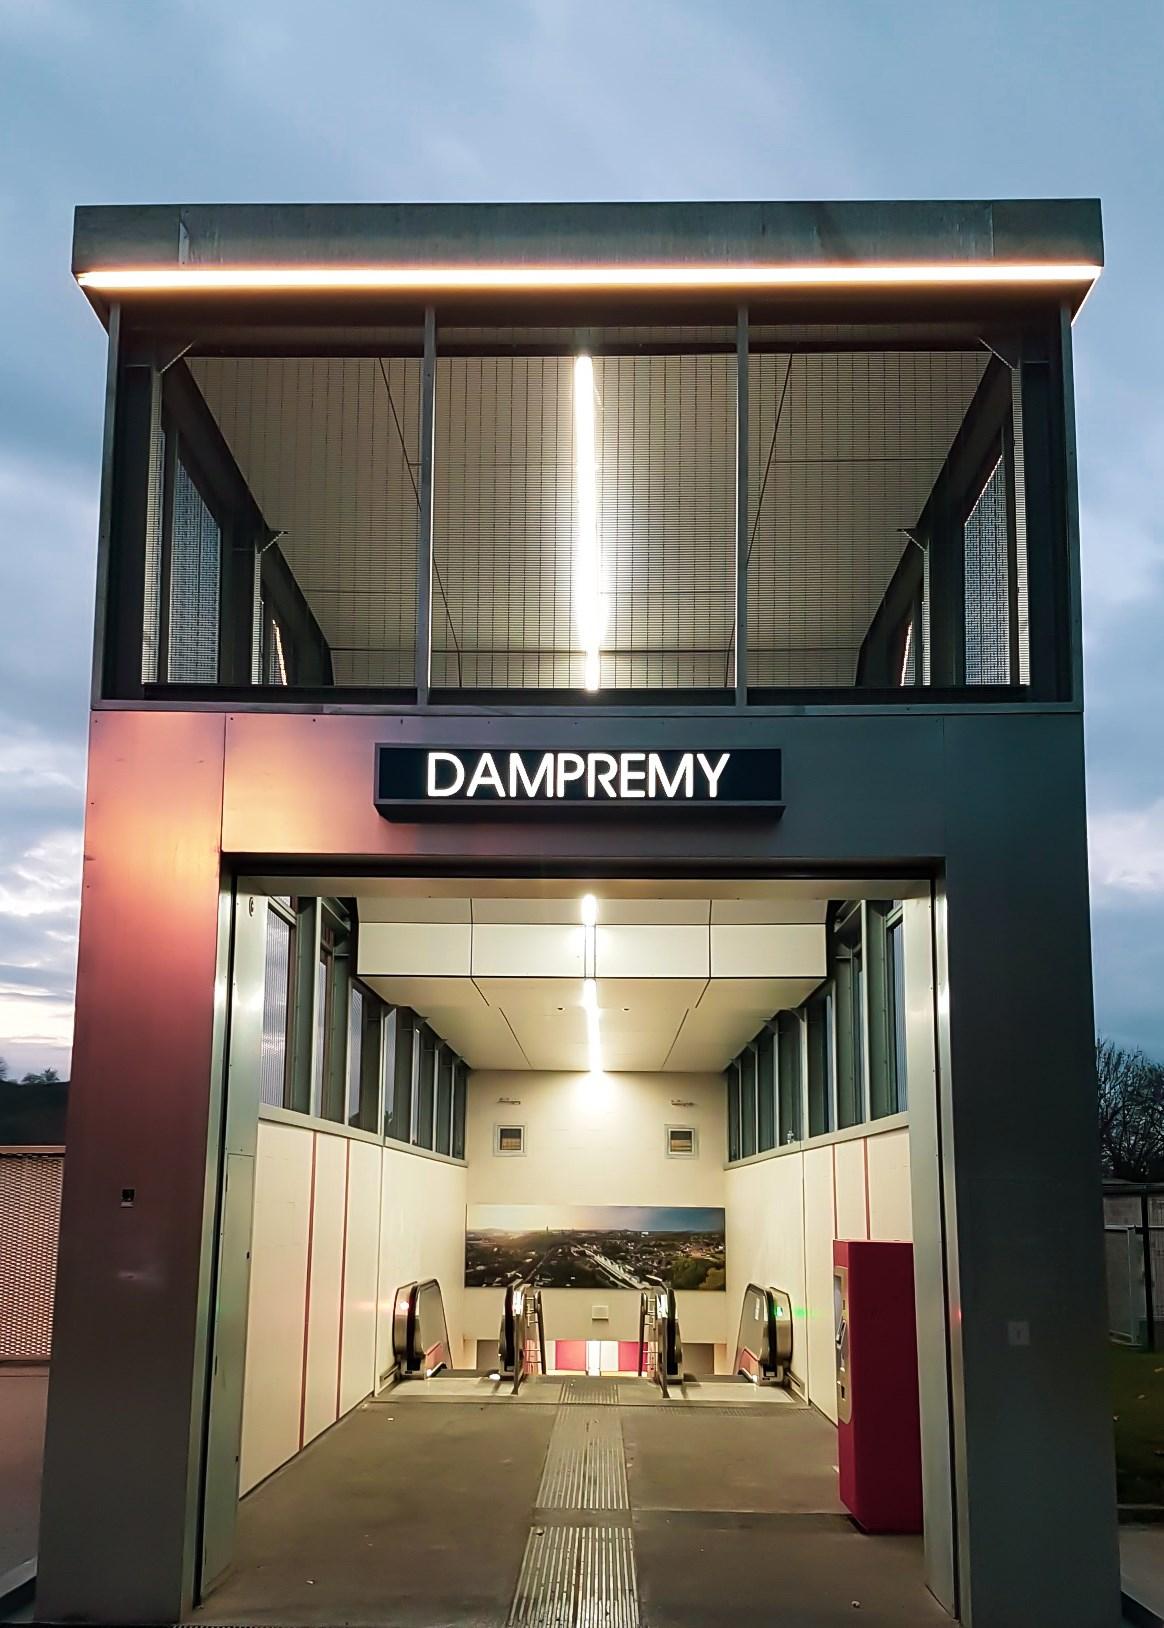 Dampremy (Charleroi Metro)